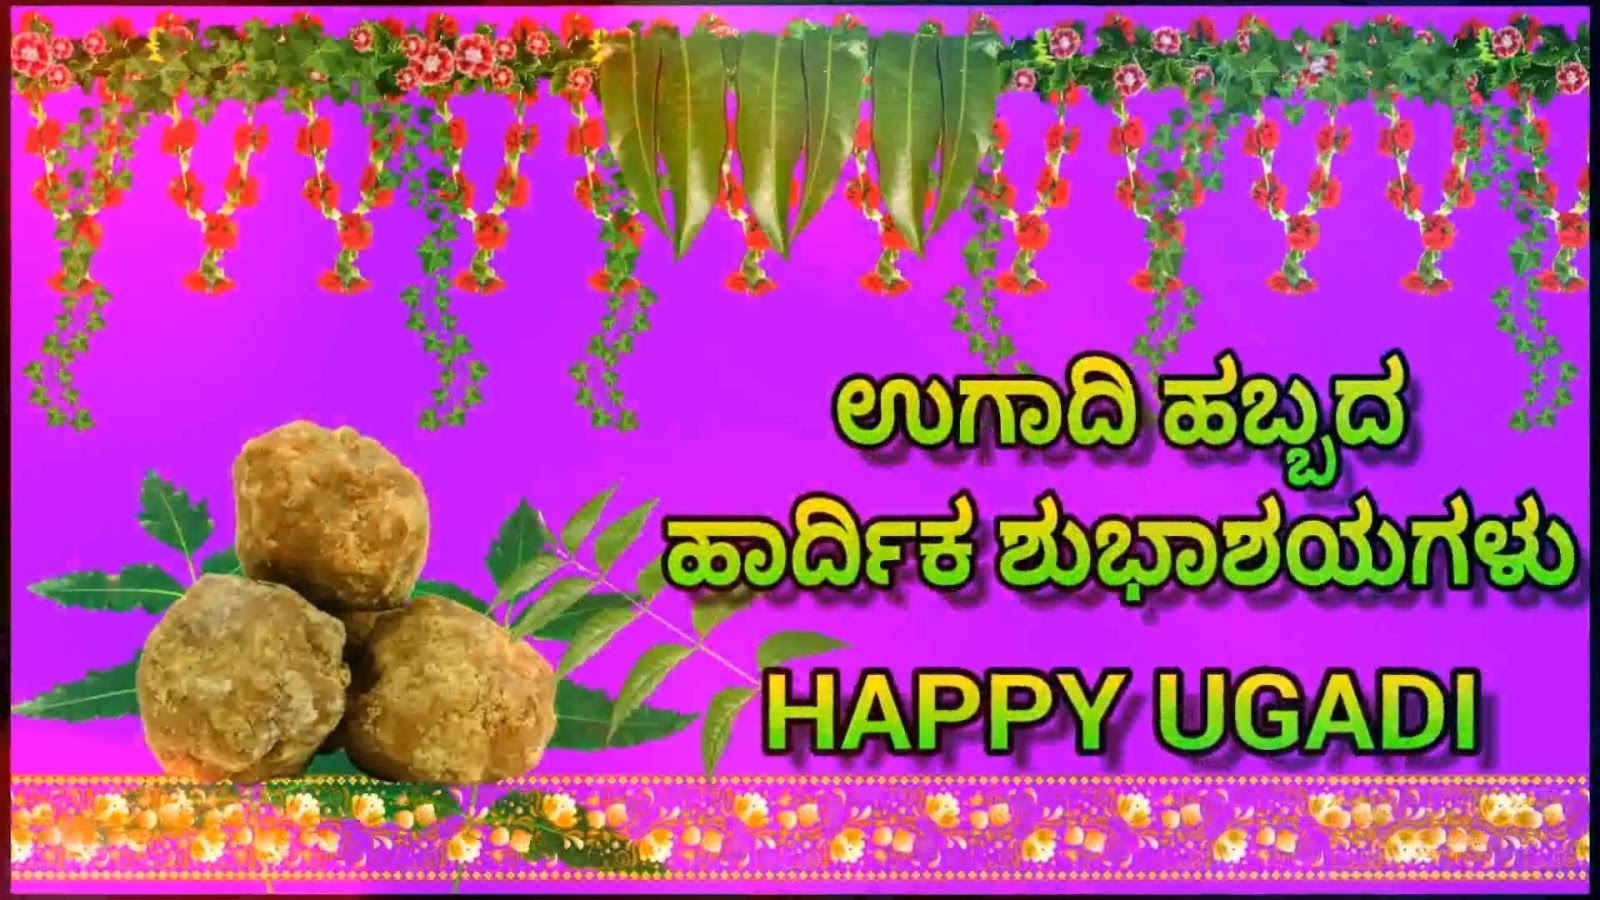 Happy ugadi wishes 2018 ugadi images telugu kannada yugadi ugadi wishes in kannada 2018 m4hsunfo